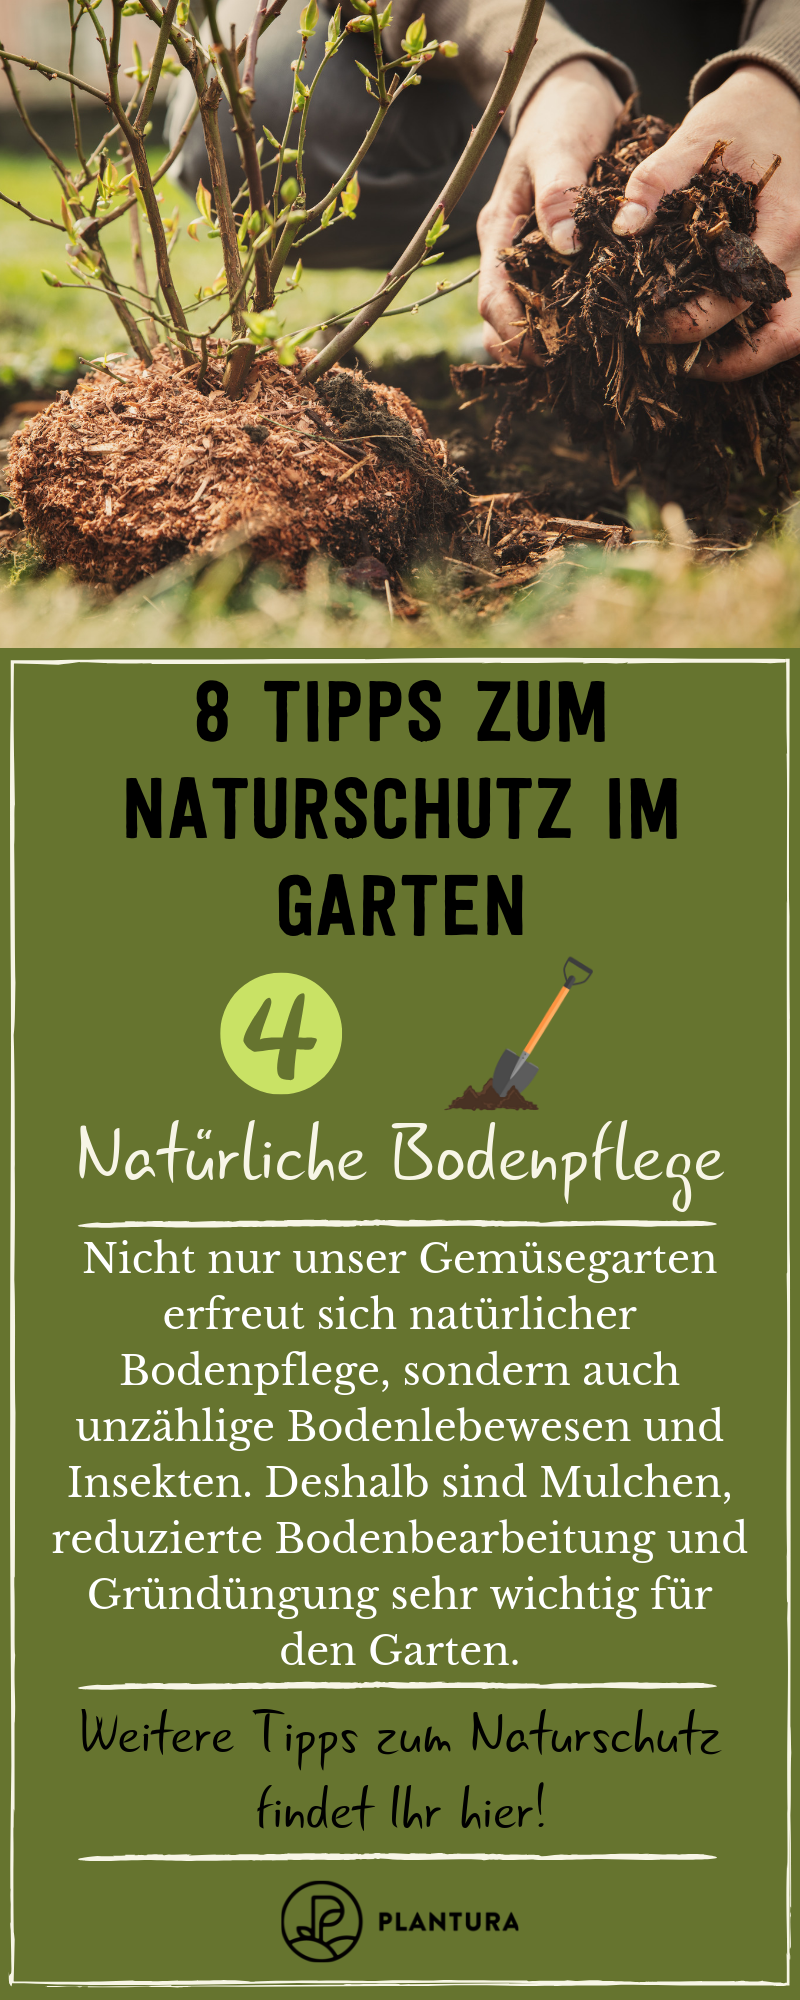 Naturschutz Im Garten 8 Tipps Fur Das Ganze Jahr Garten Naturgarten Tipps